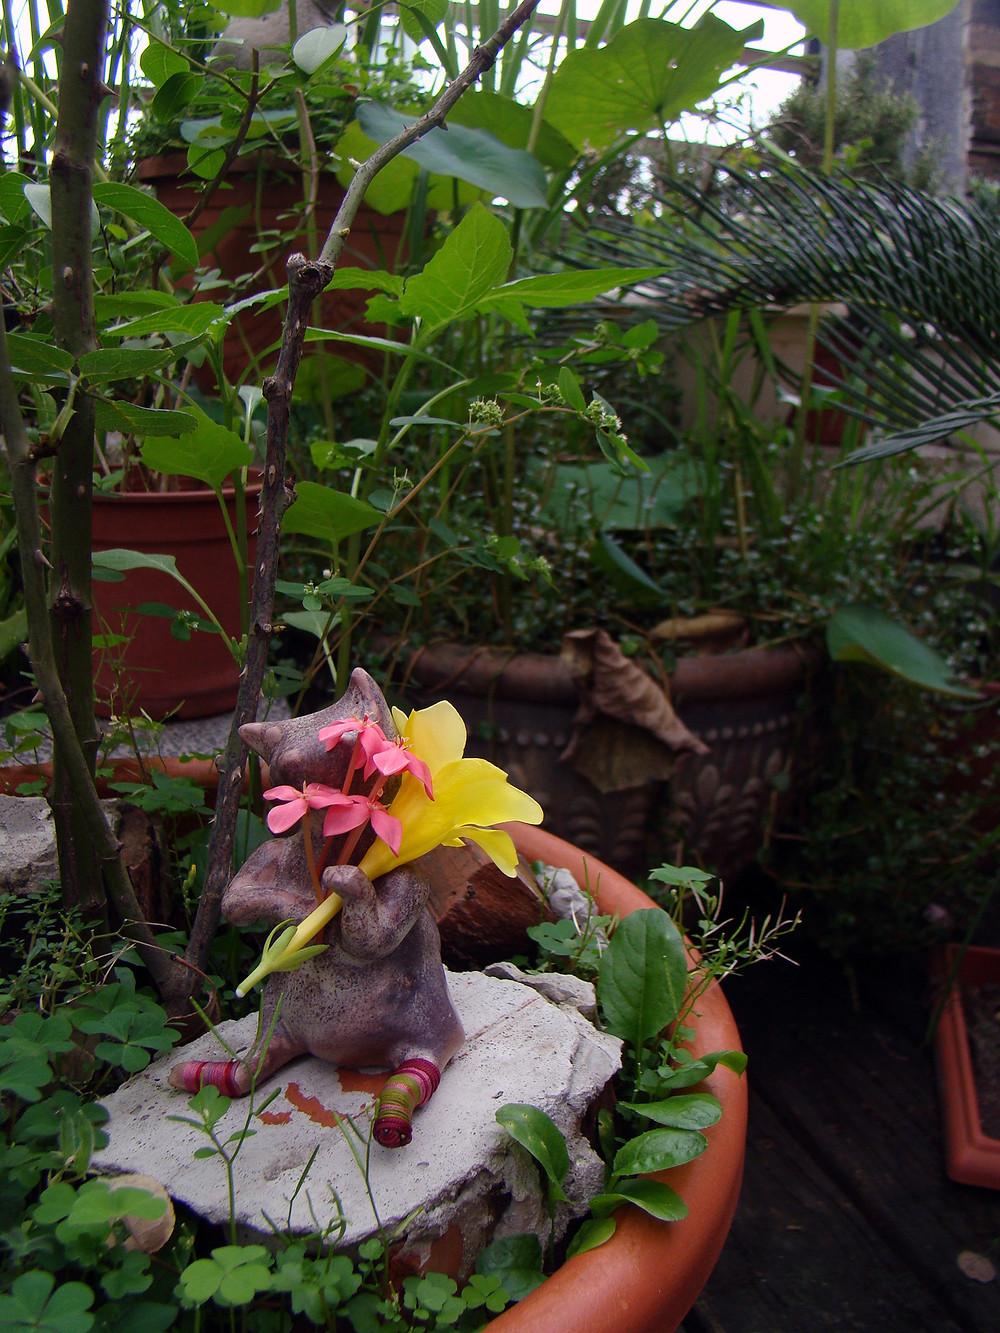 Rosa von Wein. A ceramic cat who loves flower and sweet wine.